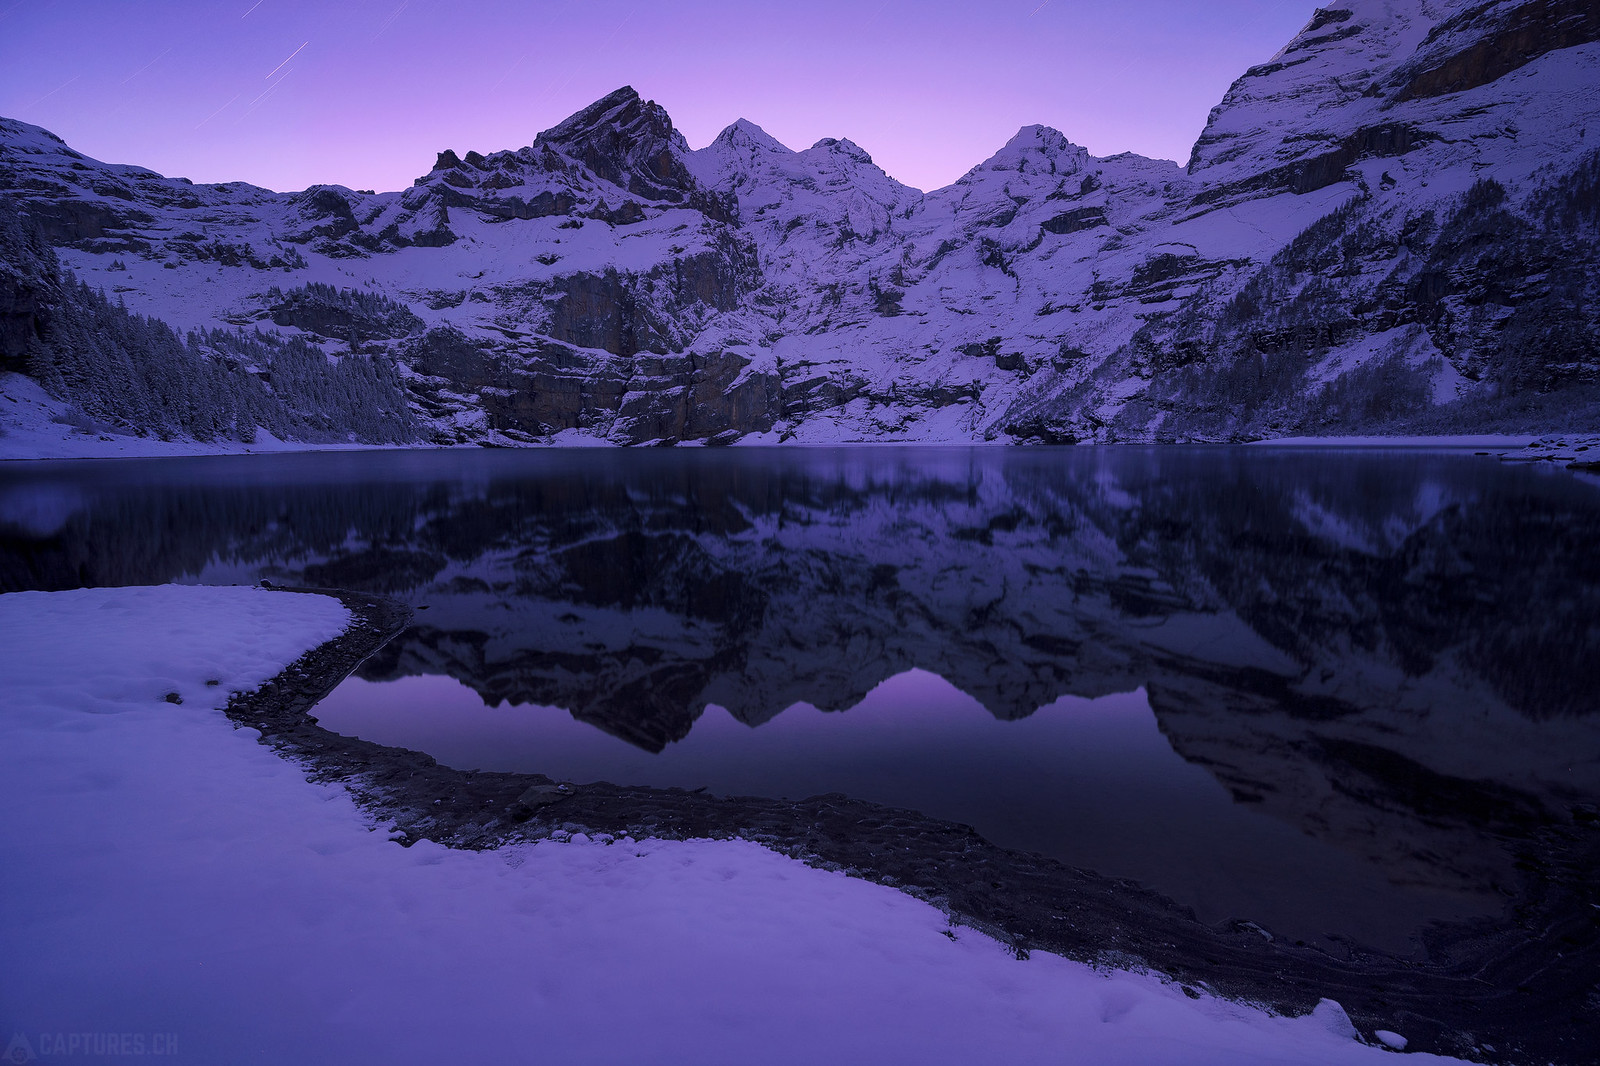 Night sky - Oeschinensee